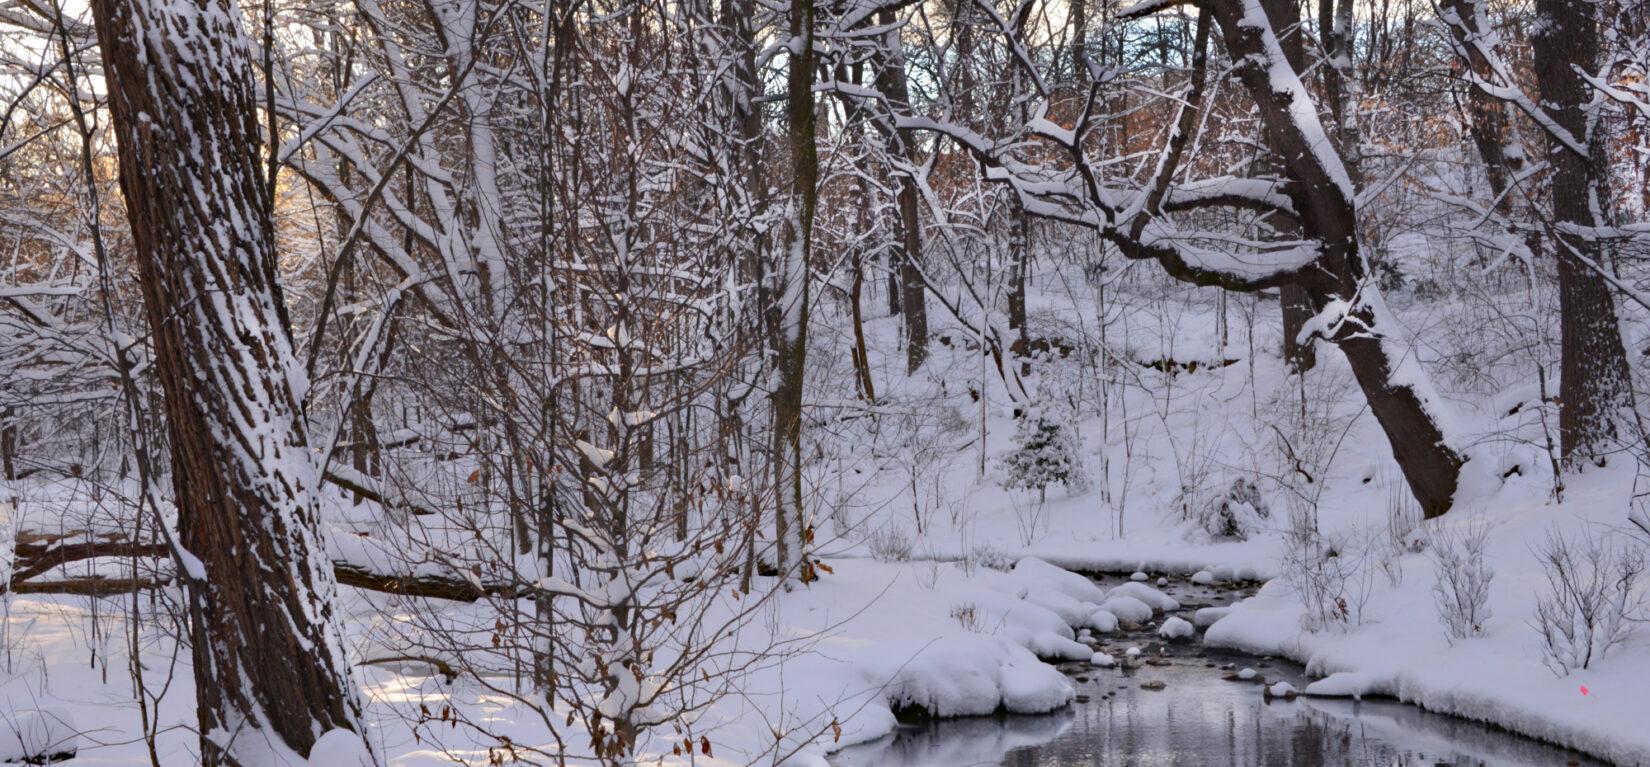 A stream runs through the Ravine, reflecting snow-laden branches